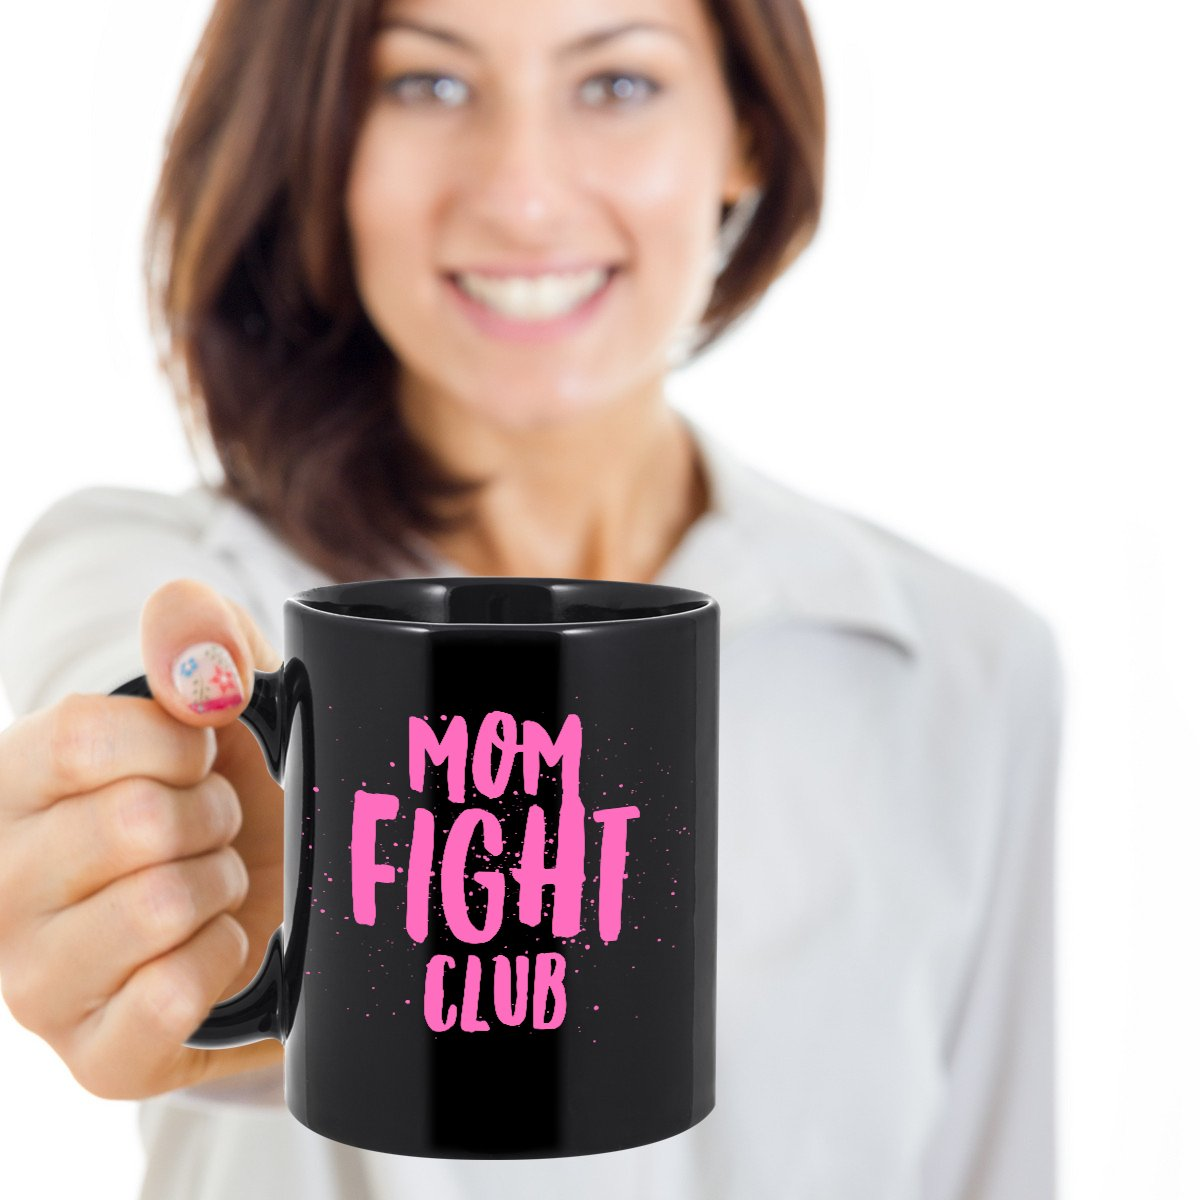 It's time to throw down! #MomFightClub #SundayMorning  https://t.co/rE1kNk9aab https://t.co/fKtDtCtuST